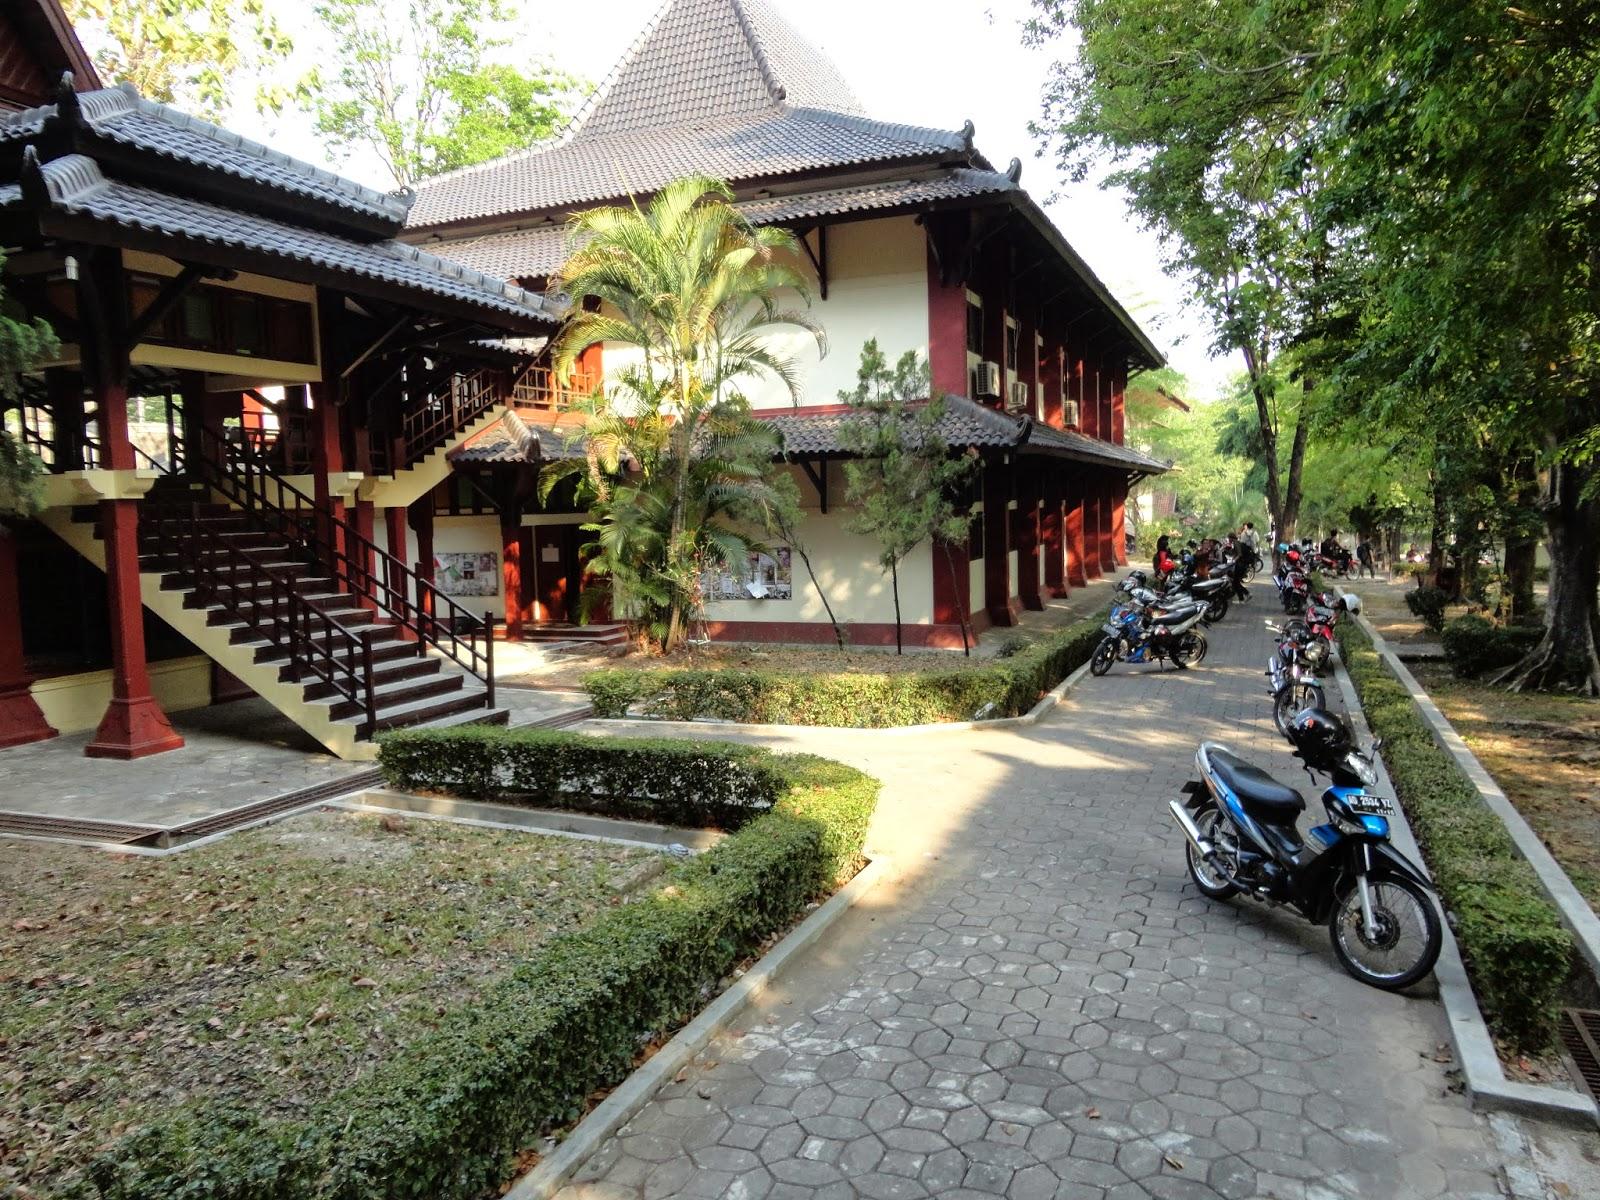 Banyumas Bamboo Gamelan - Traditional Music From Central Java